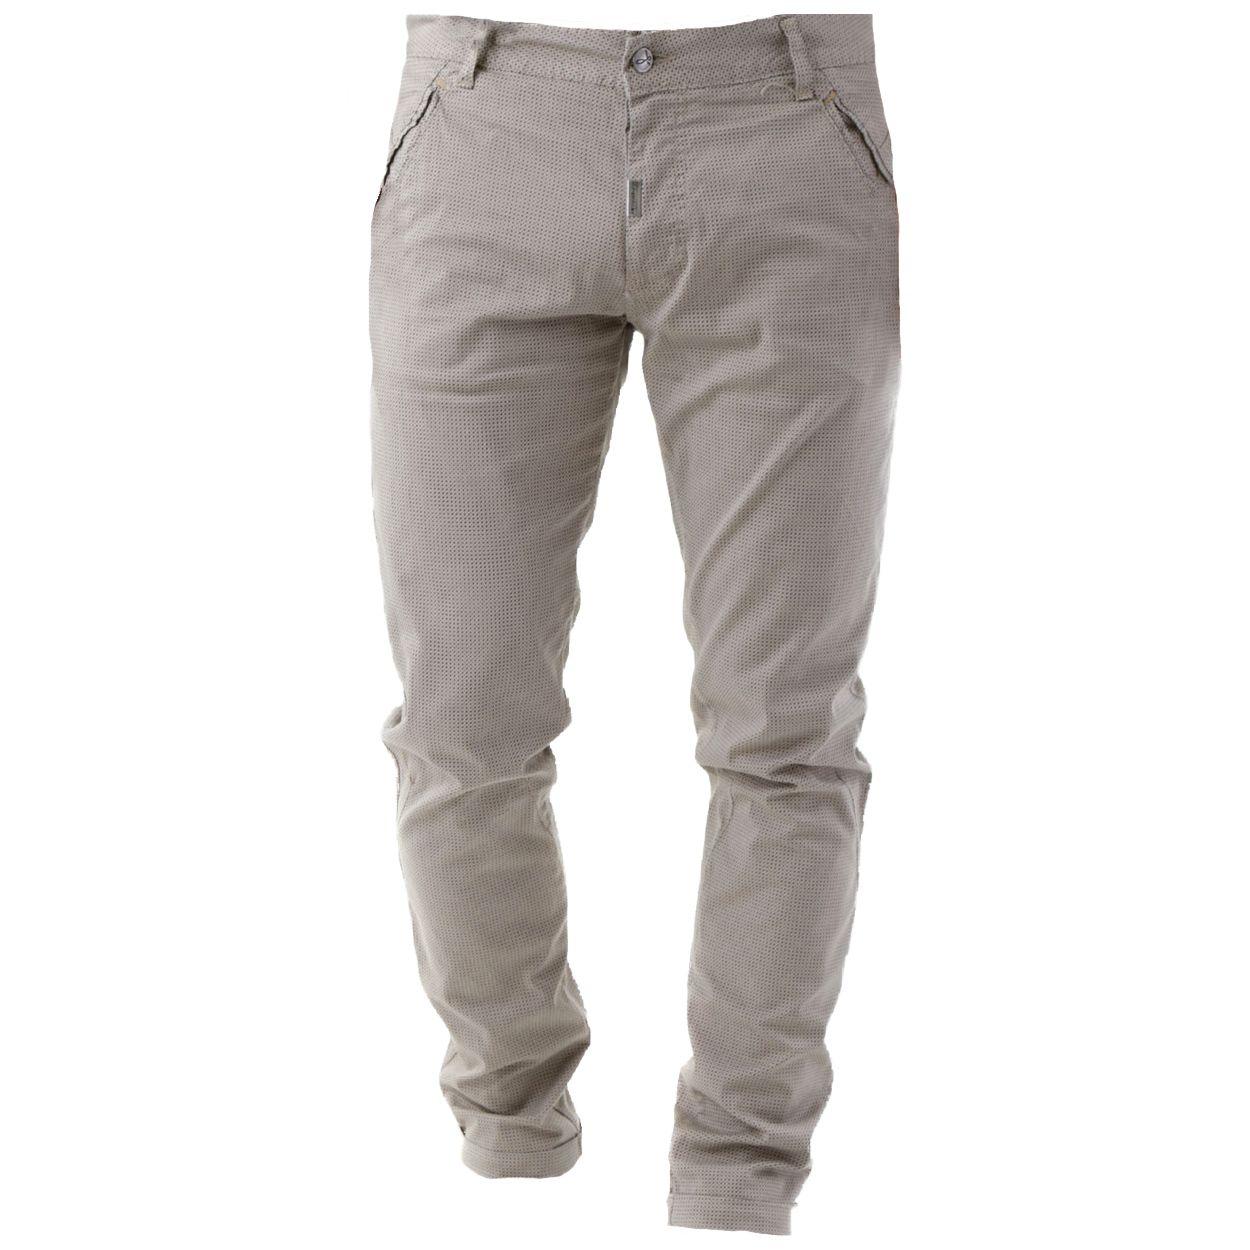 in vendita 48d41 78491 Pantaloni Uomo Cotone Slim fit tasche america Jeans Absolut Joy M ...